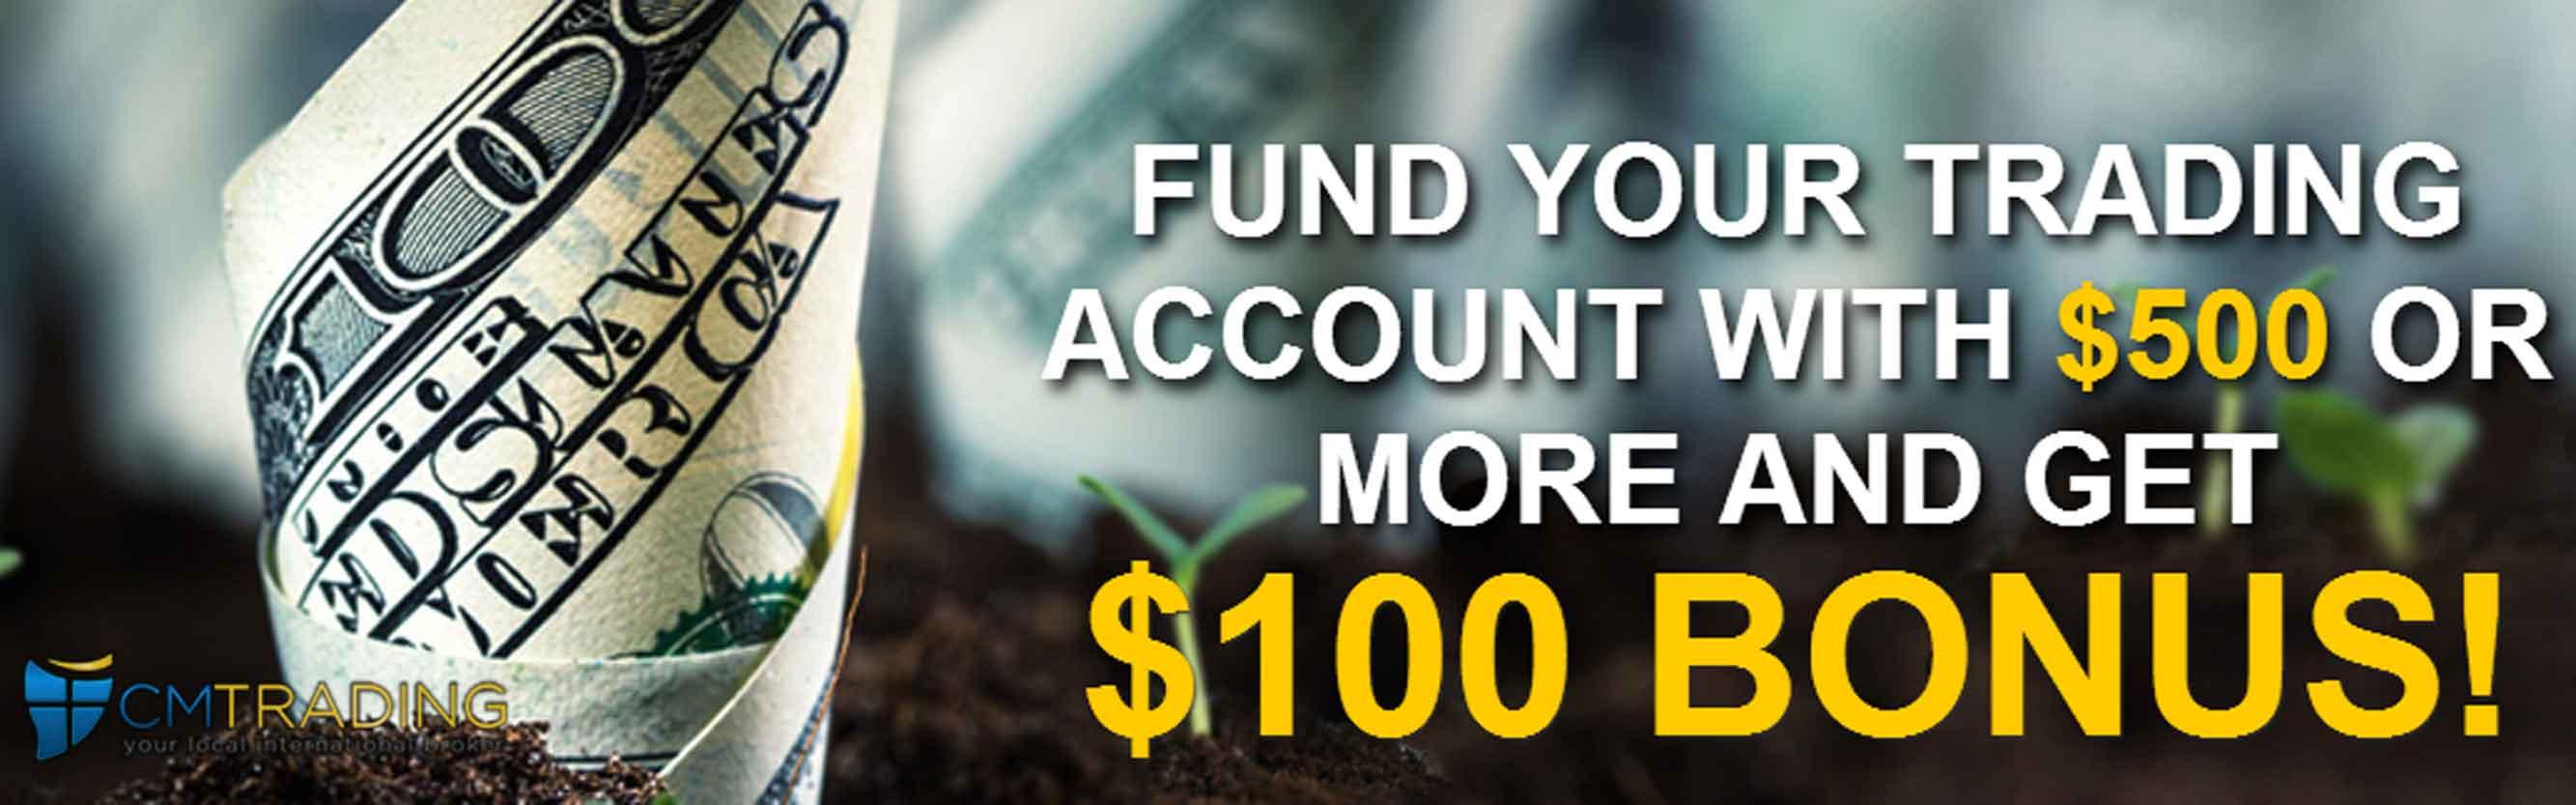 cmtrading deposit bonus